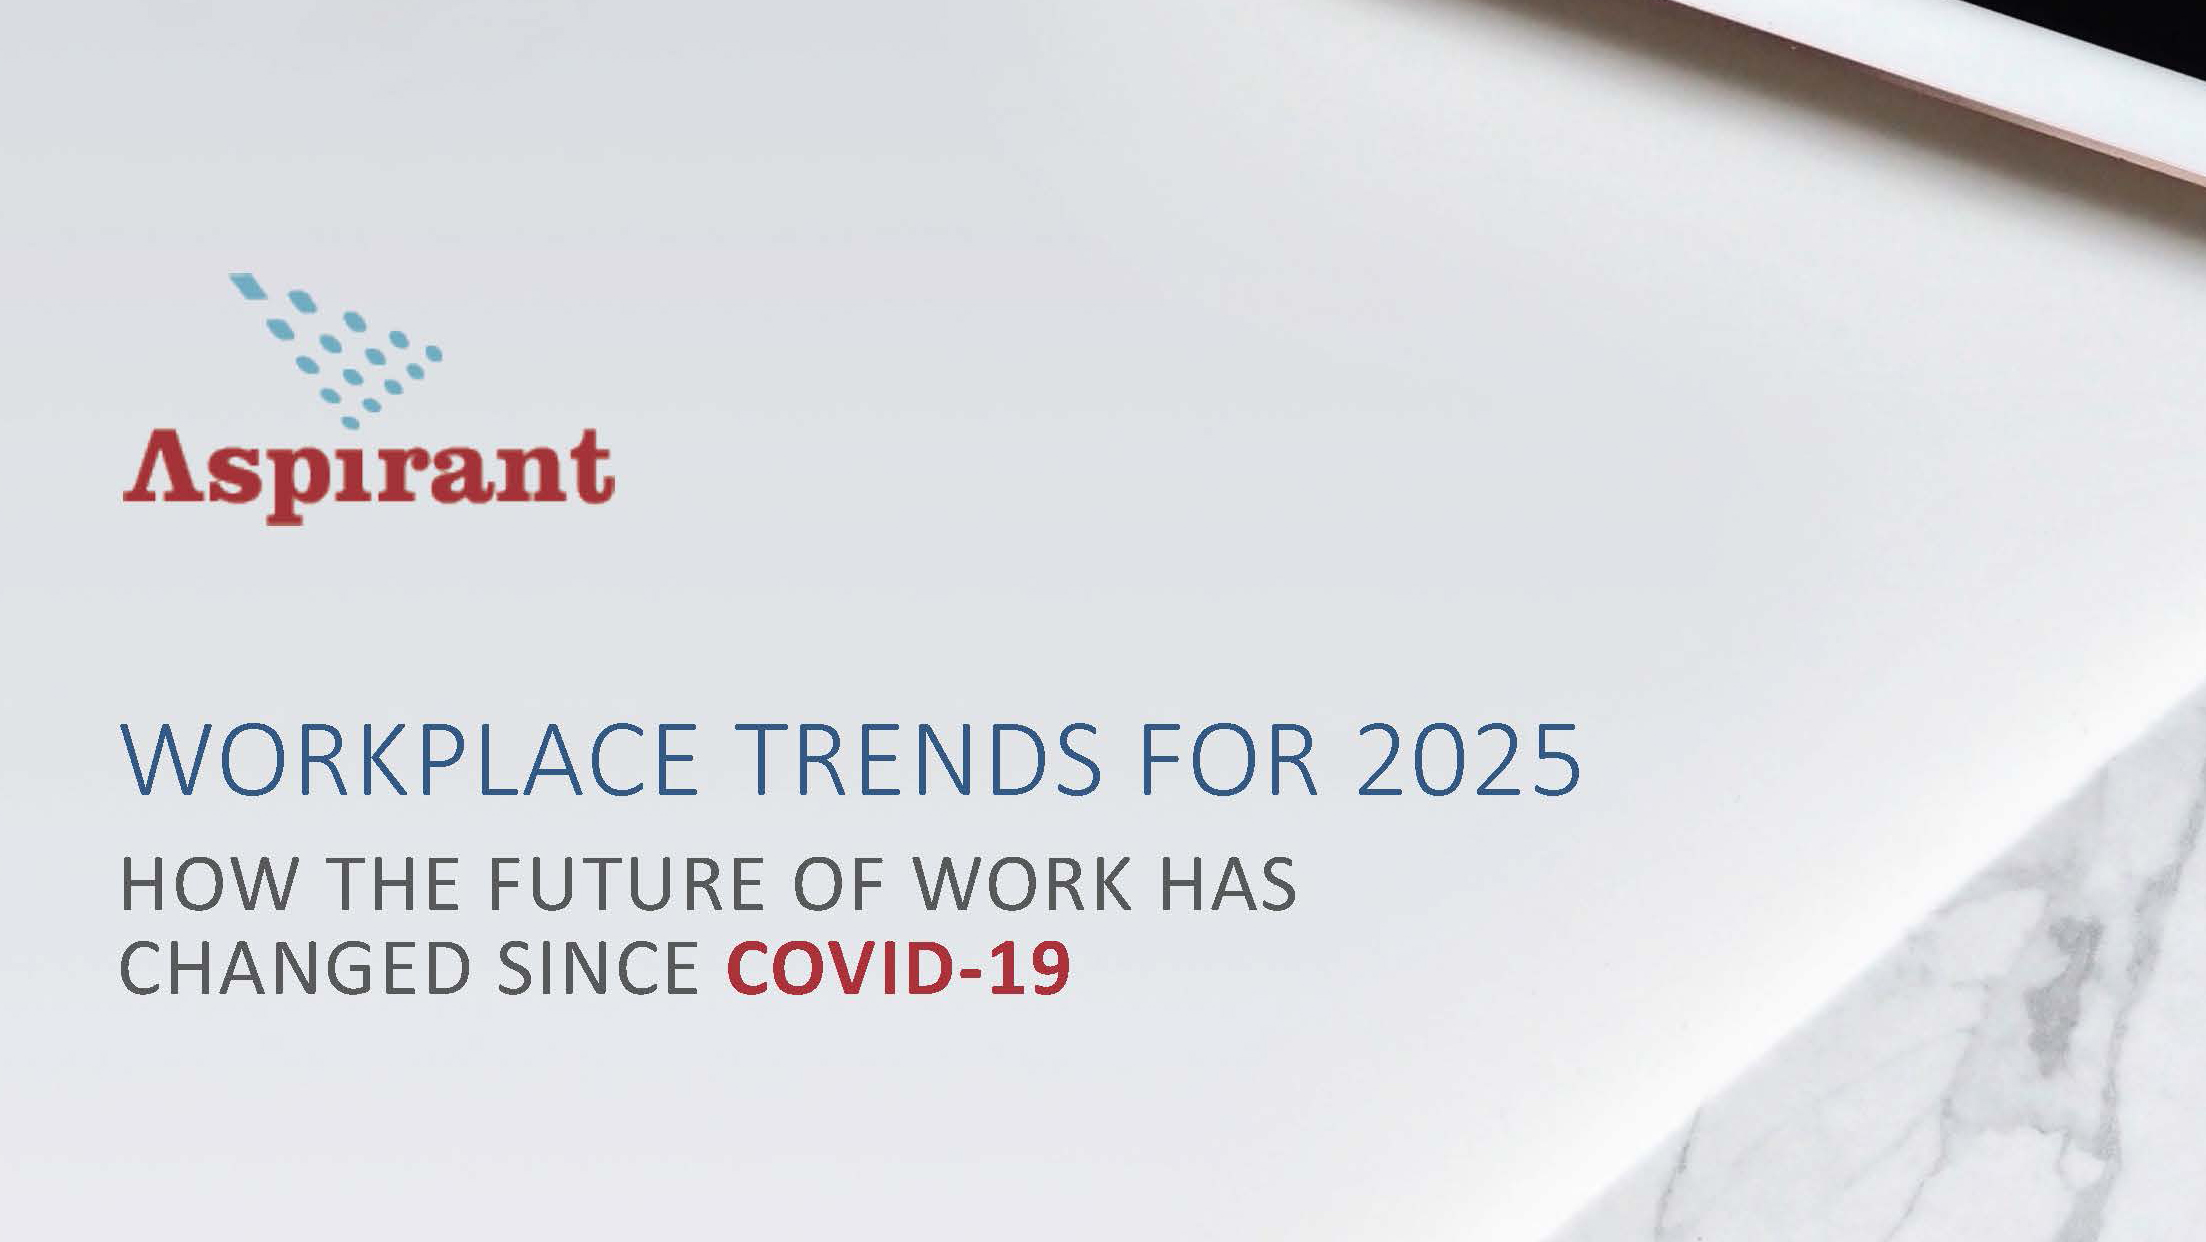 Aspirant - Workplace Trends for 2025 V2